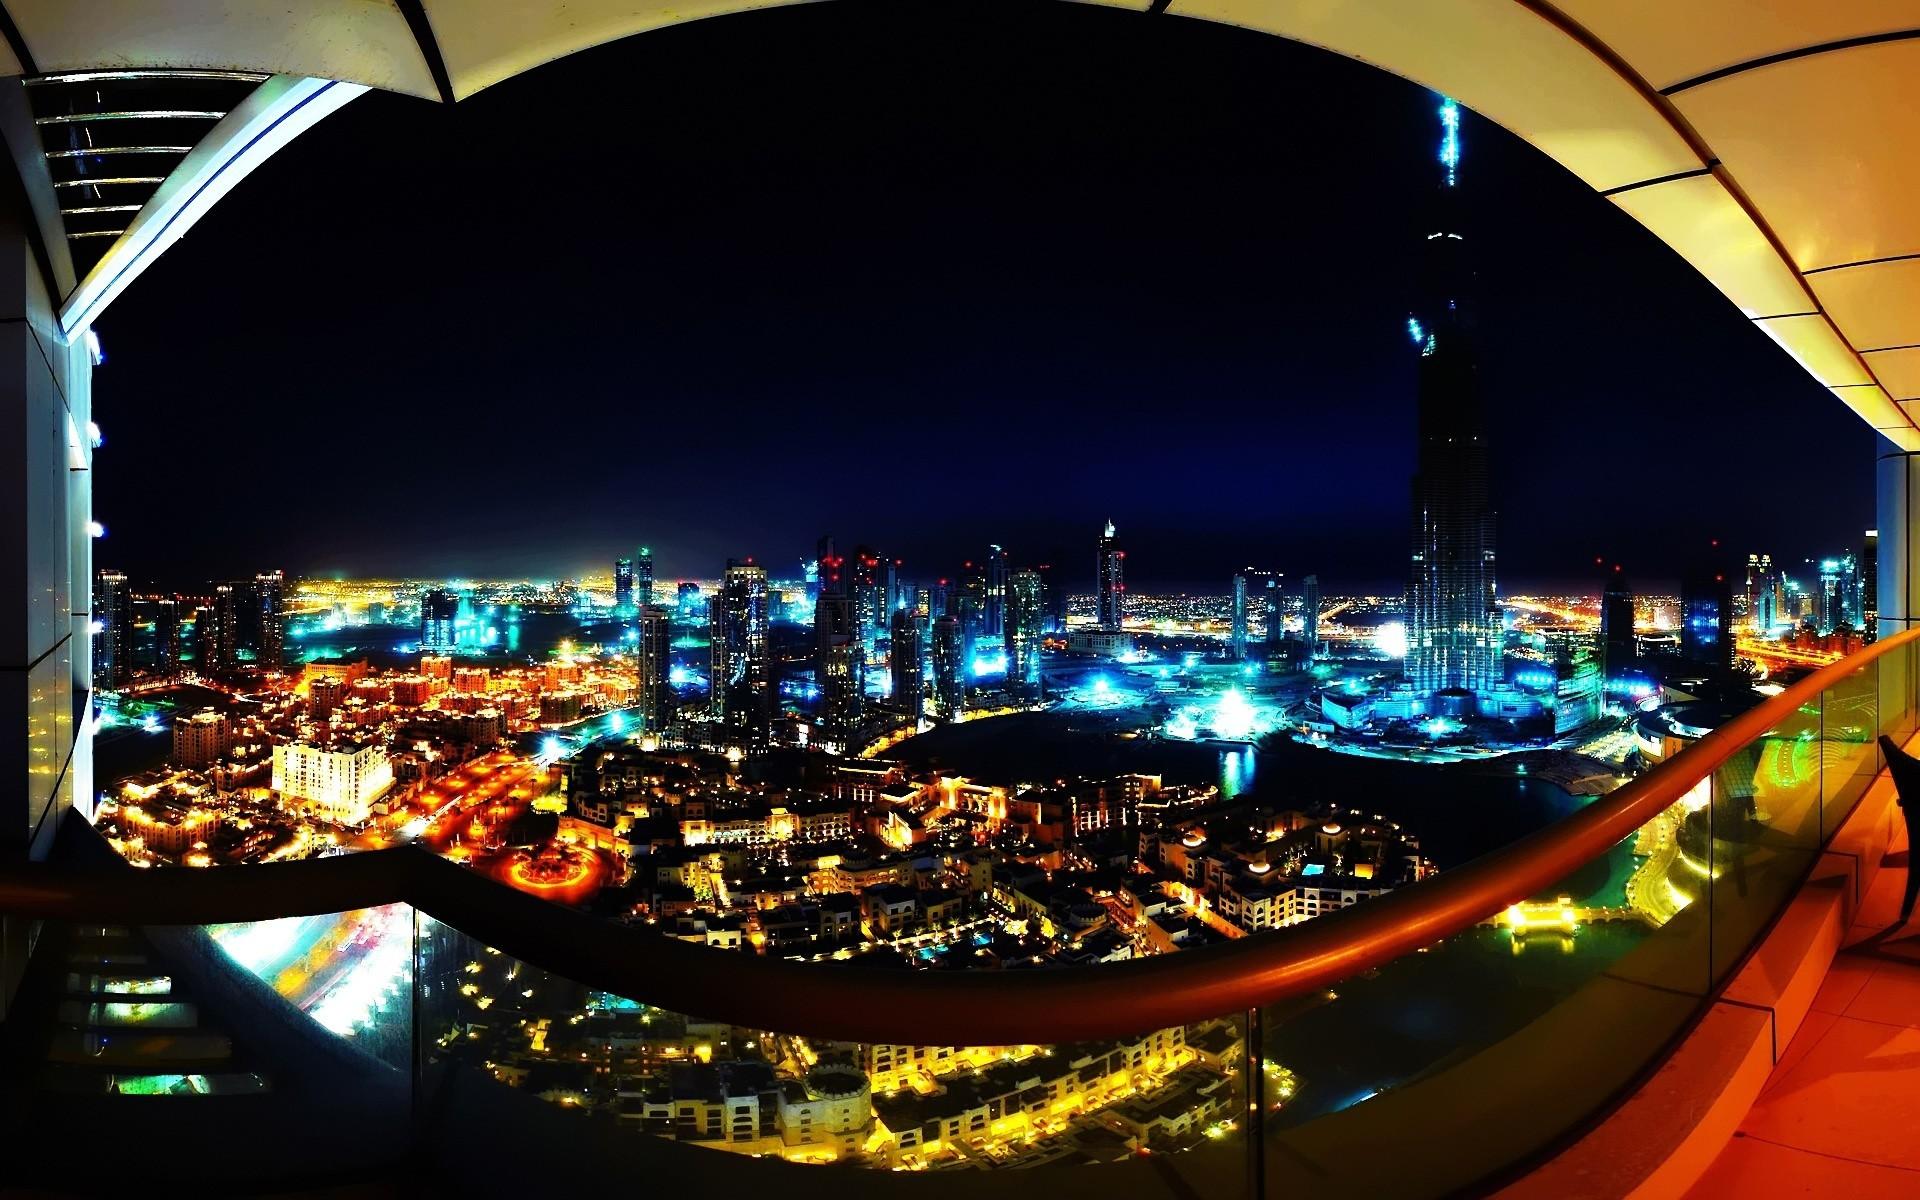 Wallpaper city, view, night, city lights, buildings